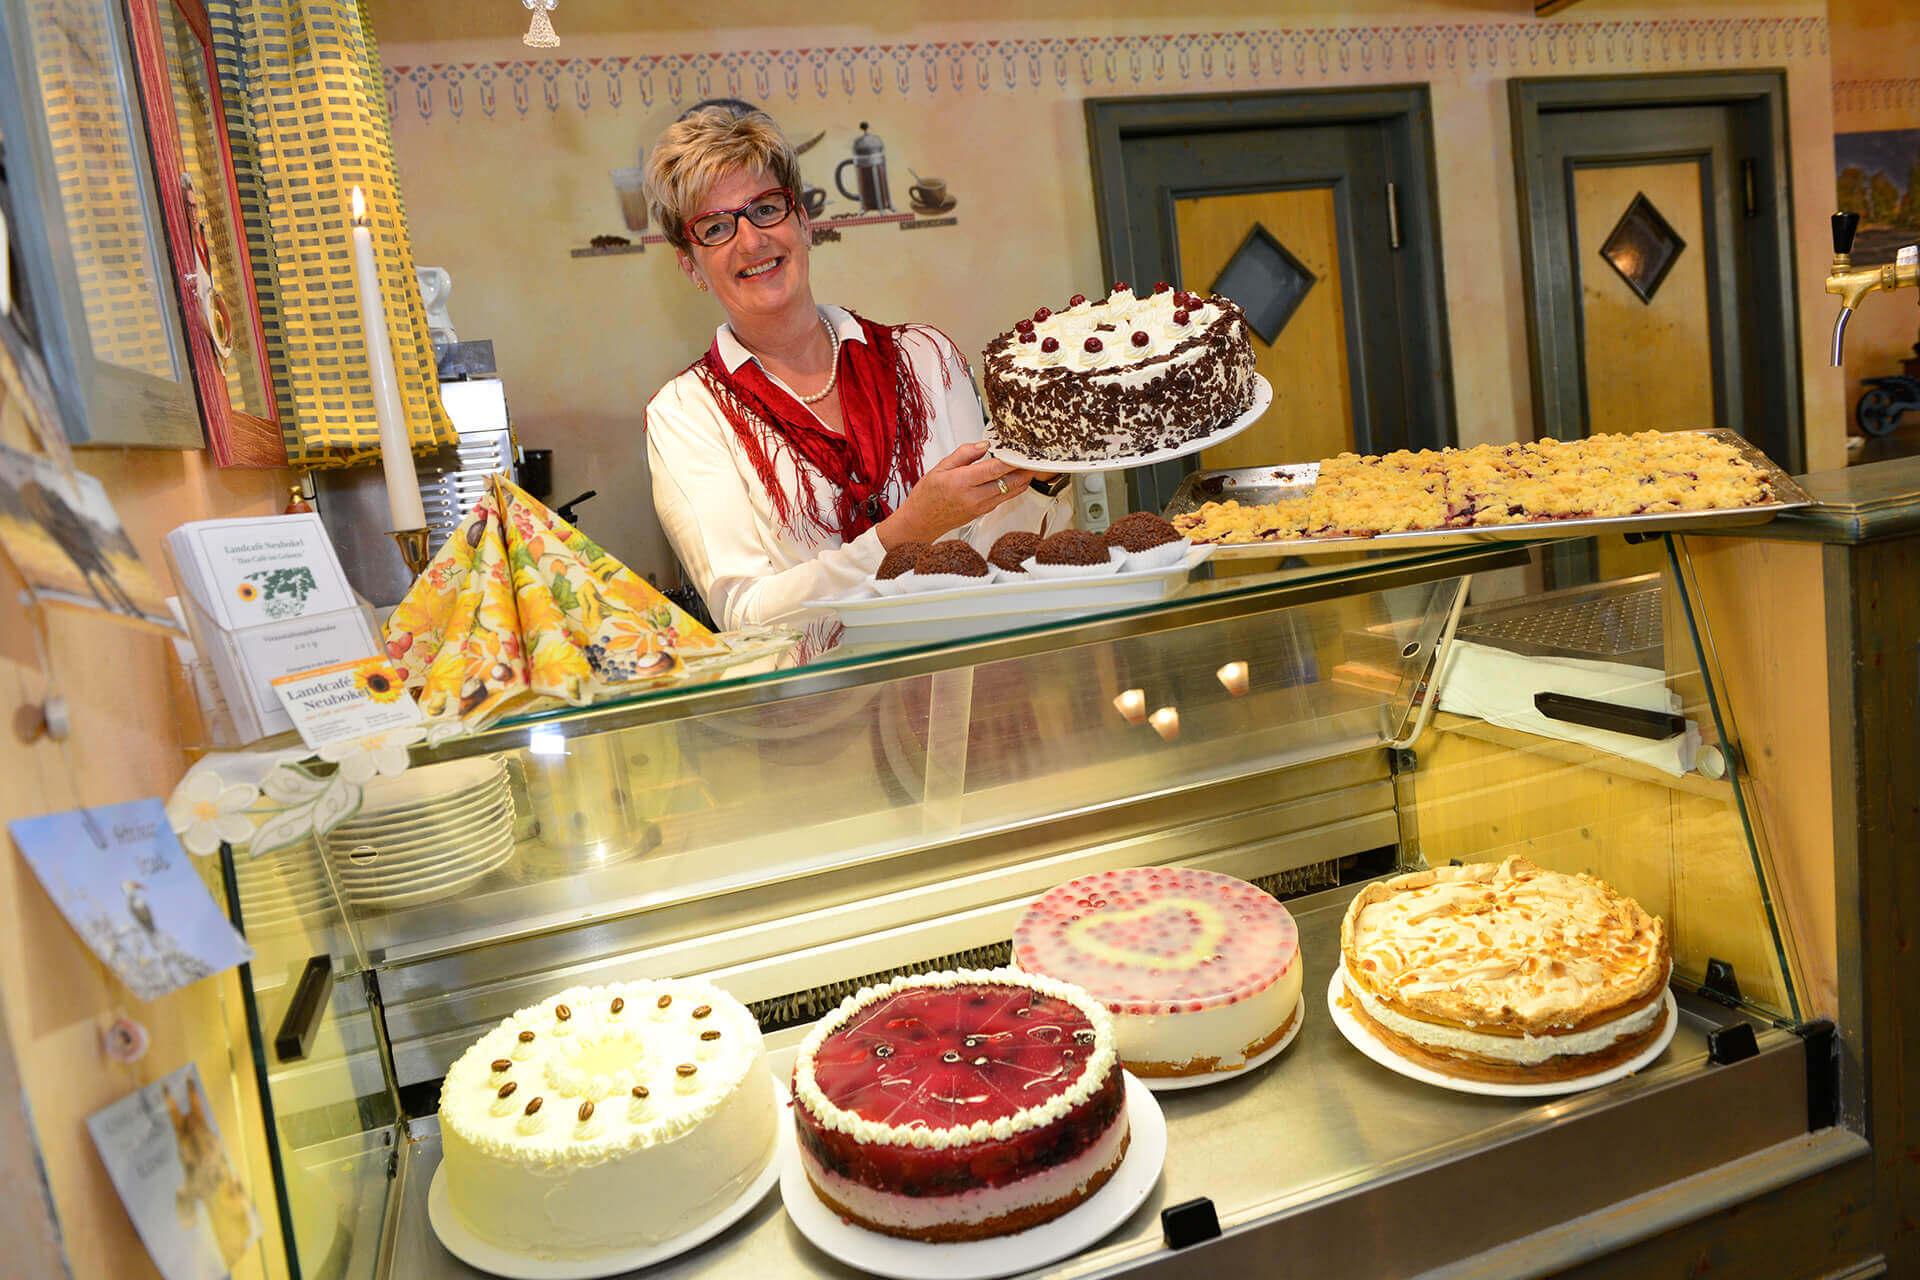 Kuchenauswahl im Landcafé Neubokel